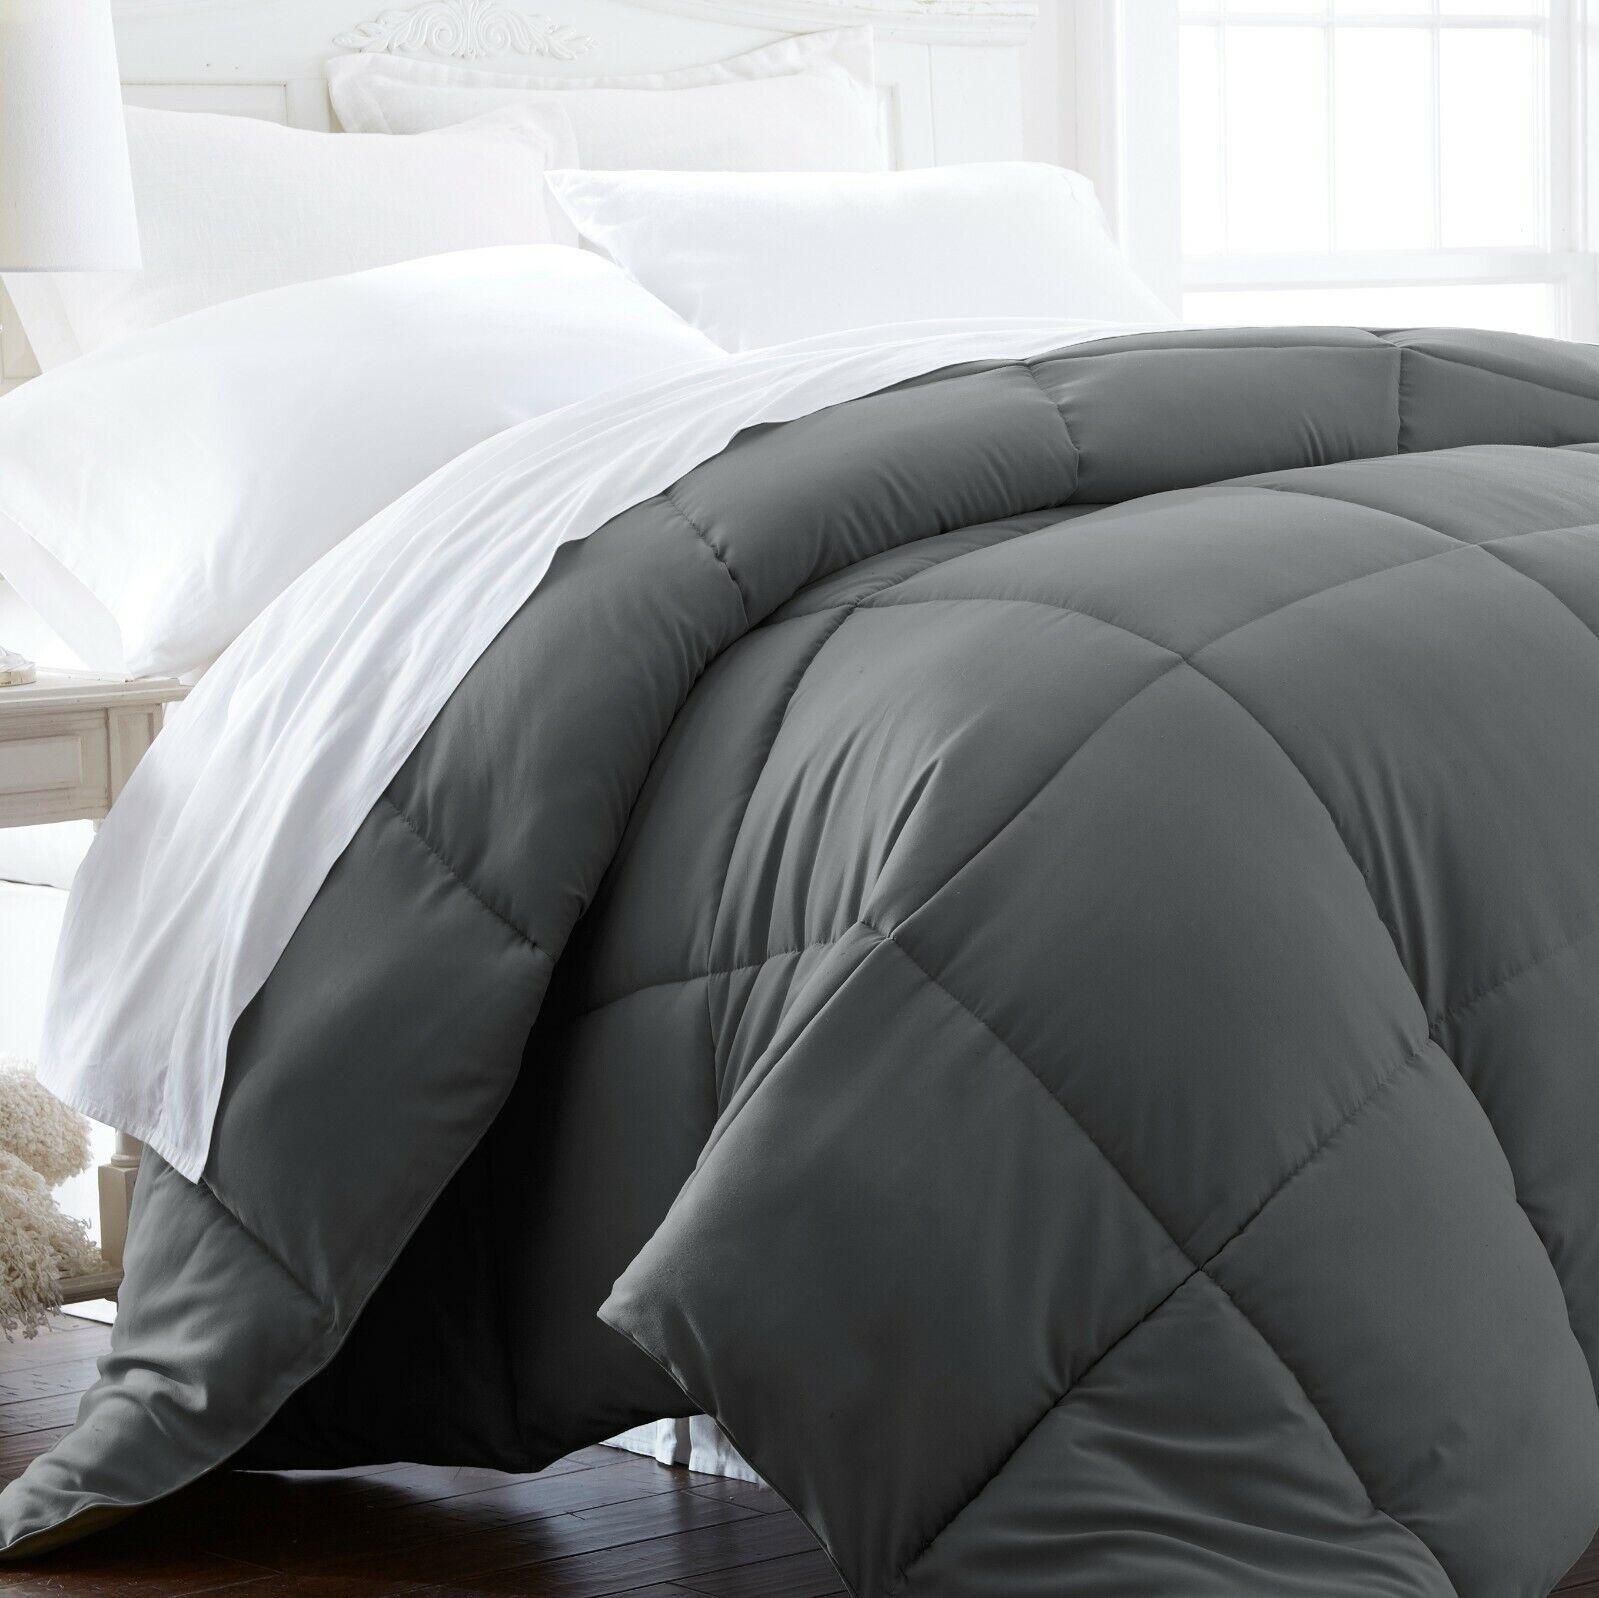 Simply Soft Premium Goose Down Alternative Comforter - 6 Cla